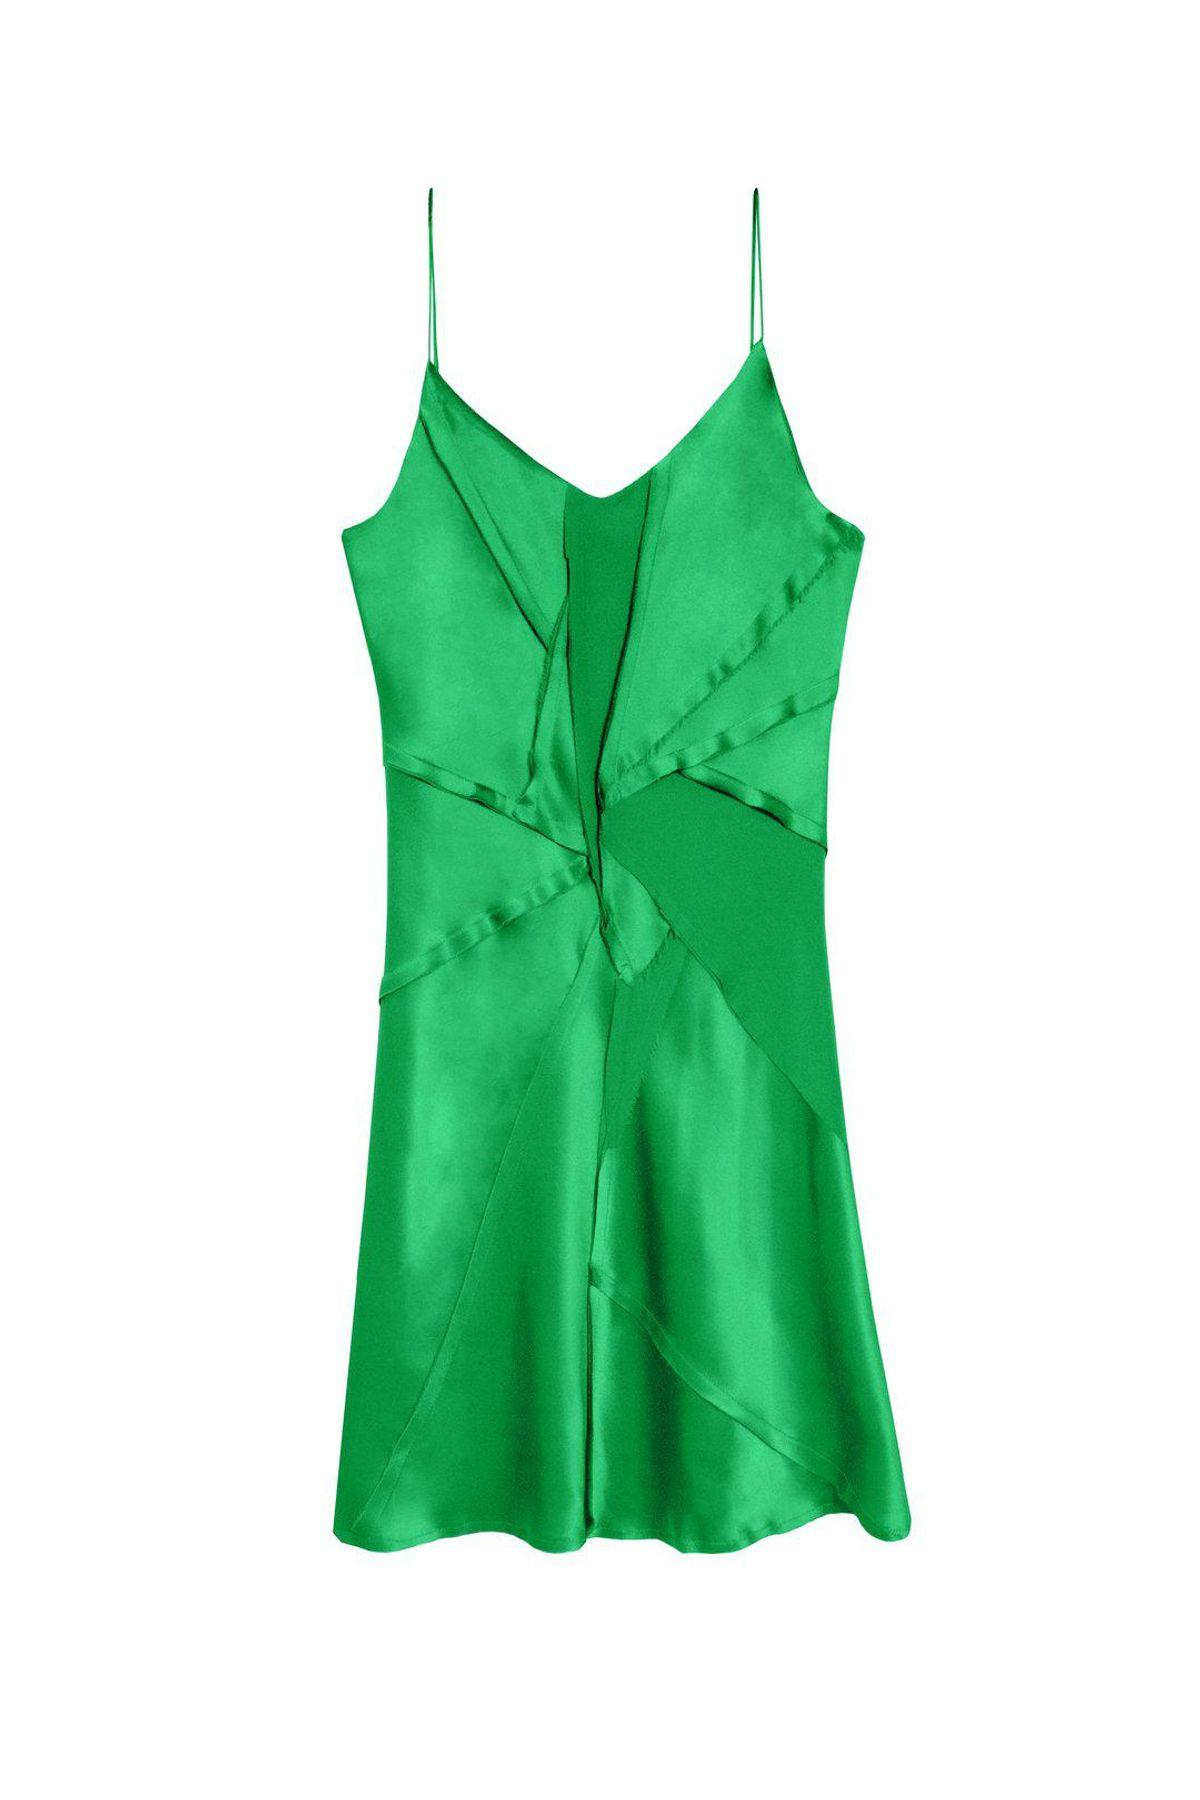 Mini Recycled Dress